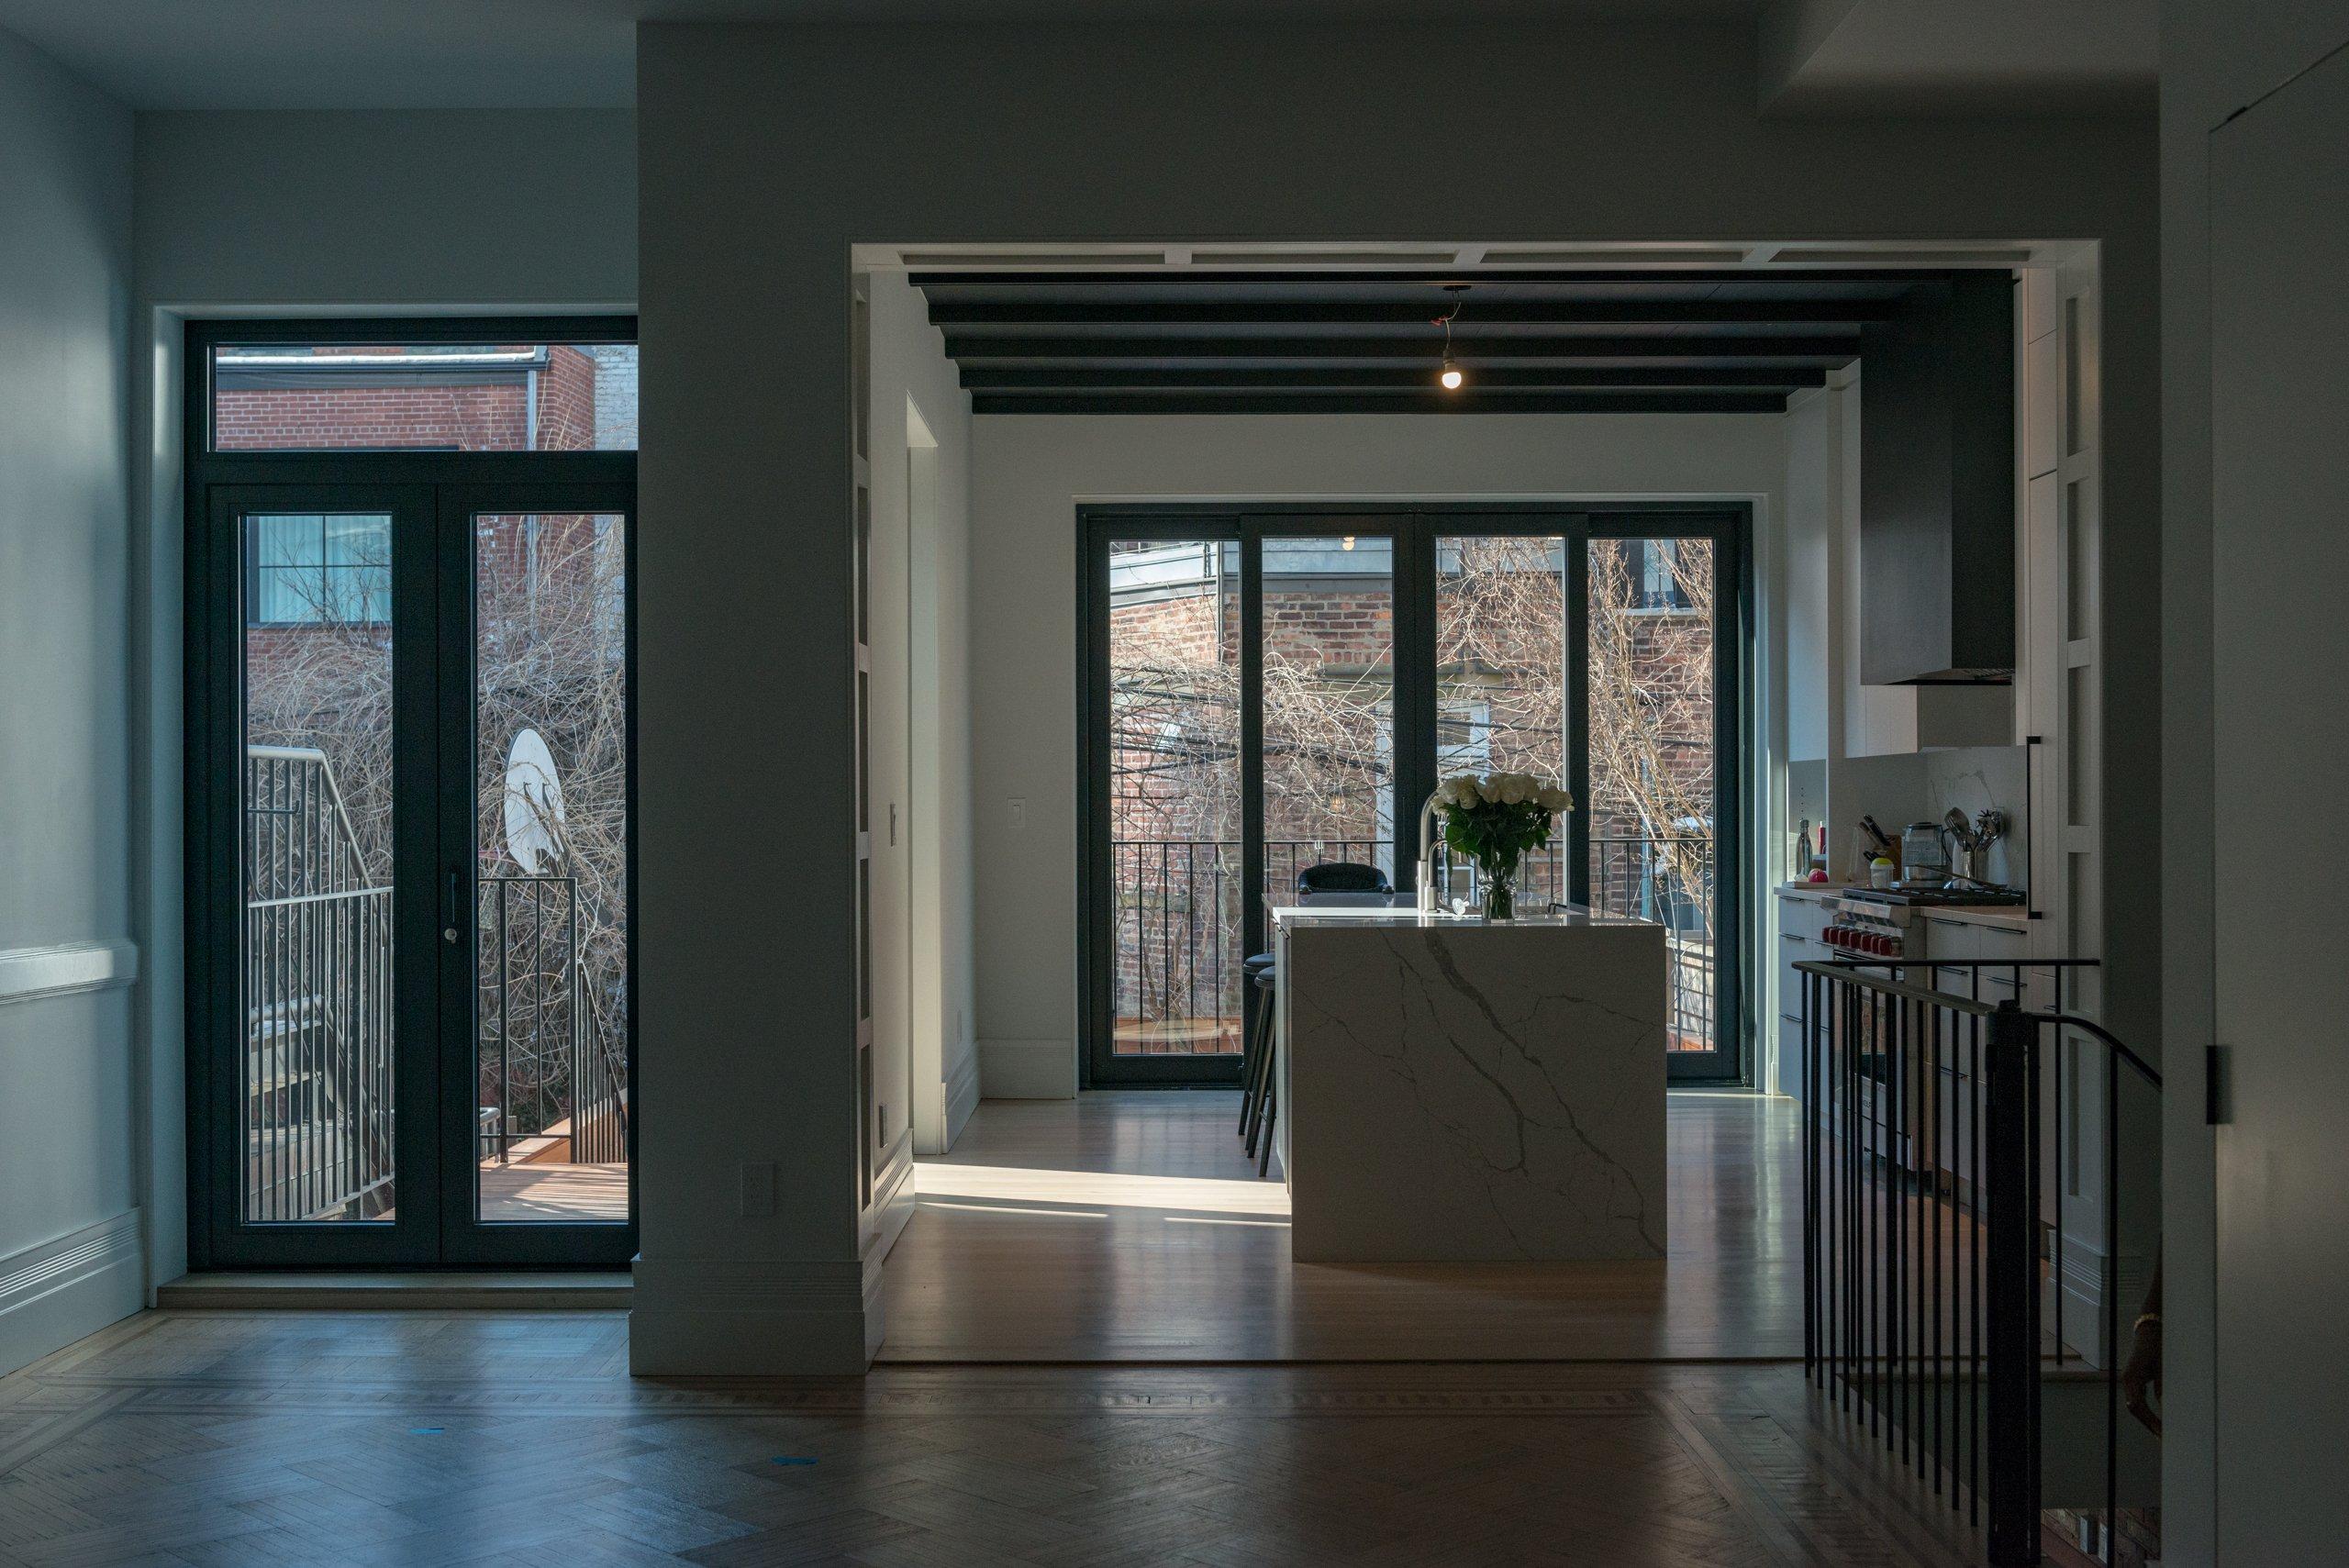 Bildau & Bussmann Windows and Richlite Millwork in Historic Landmark Renovation NYC